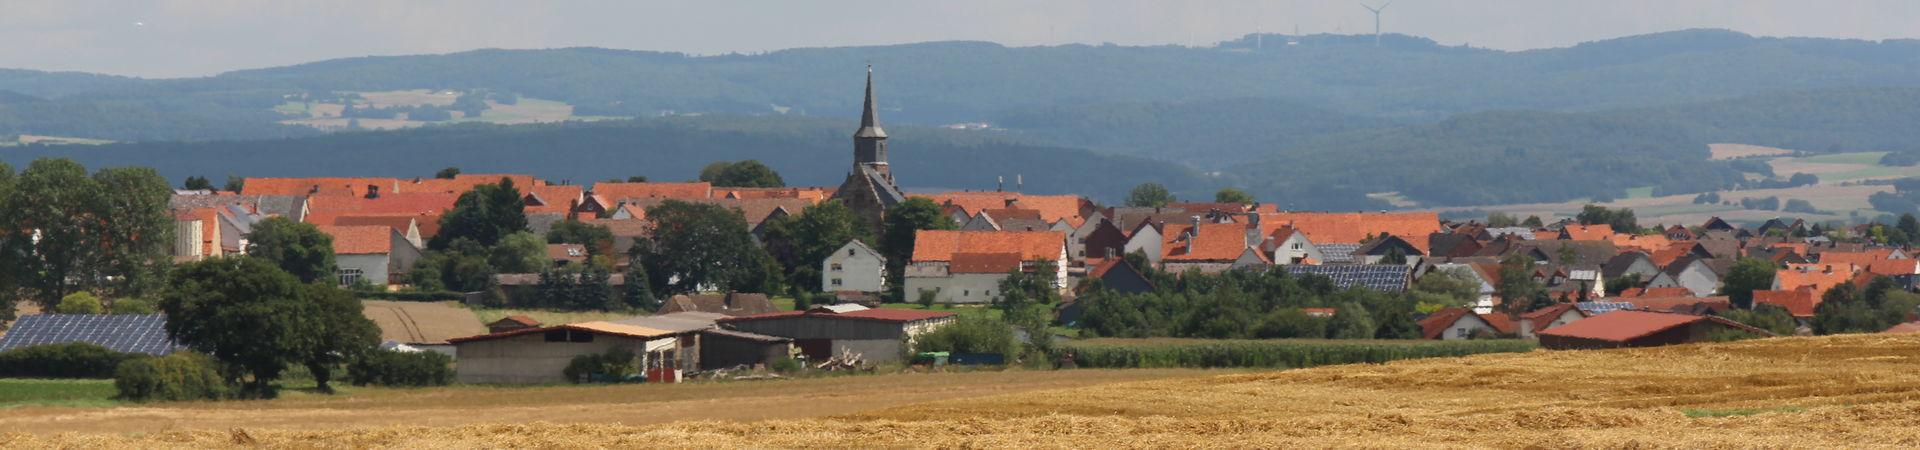 Wasenberg